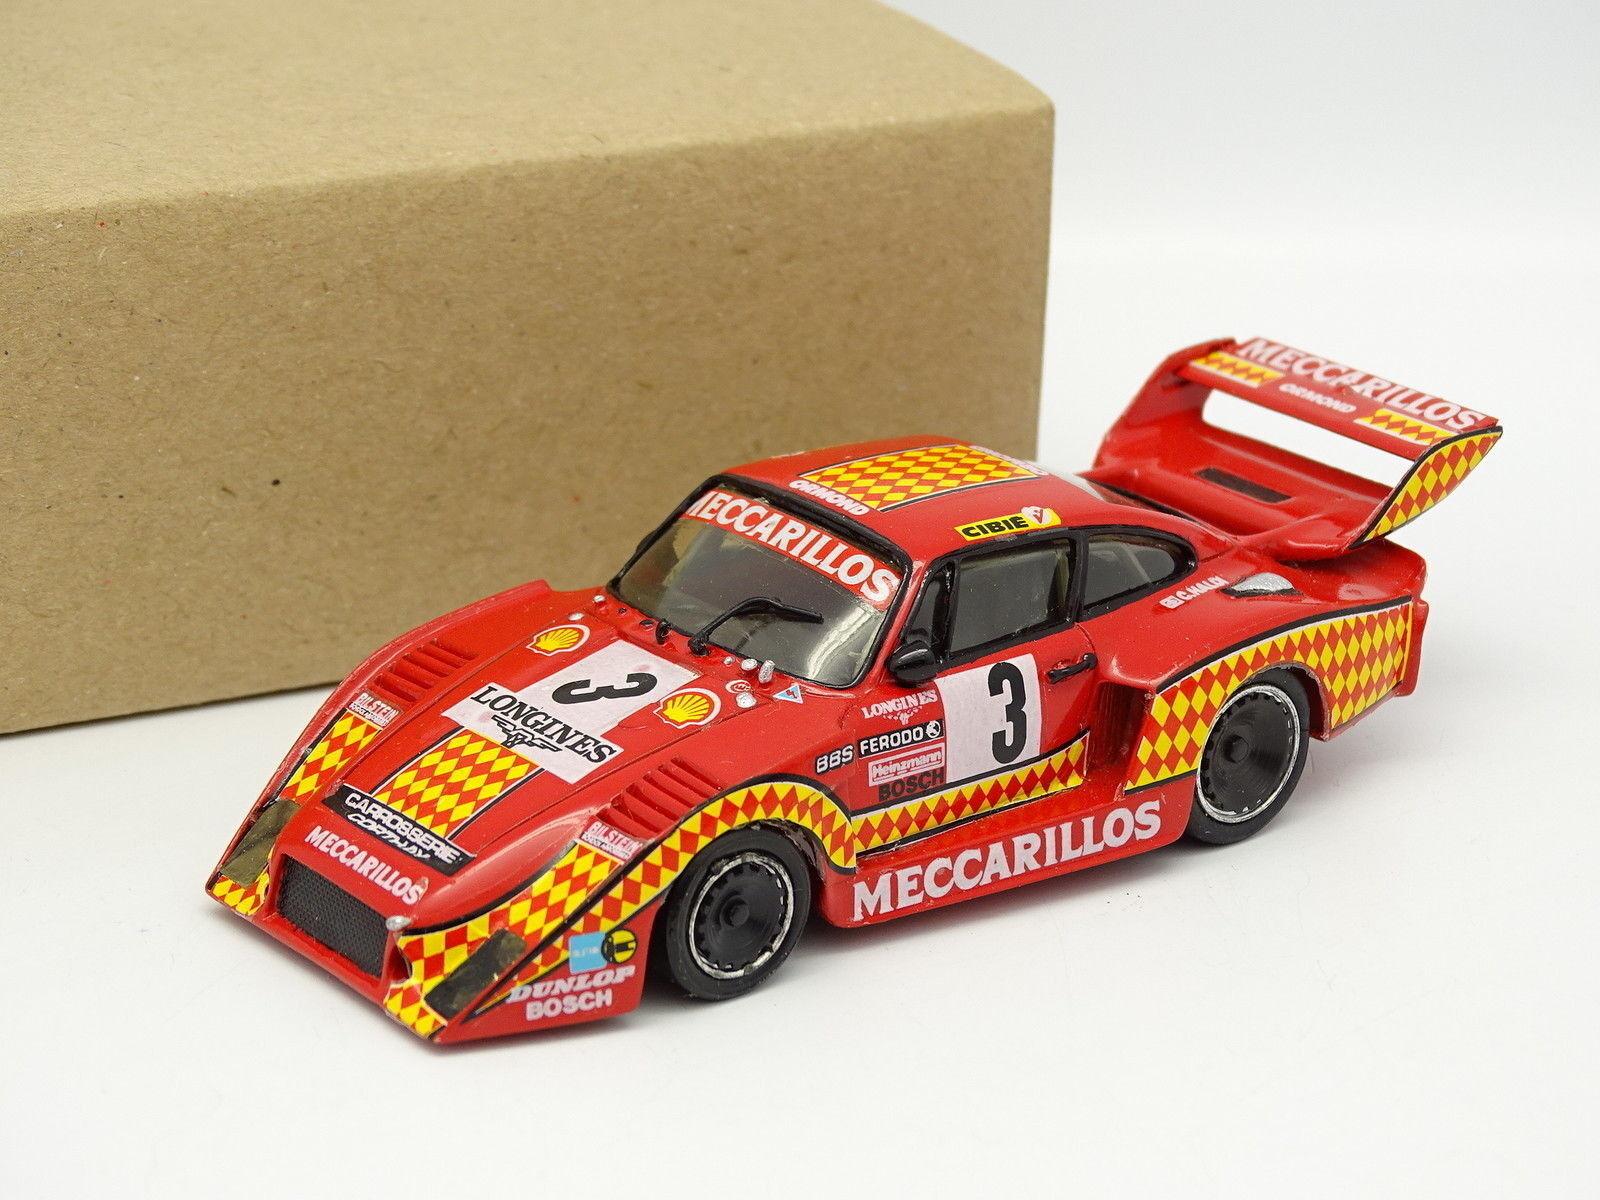 Record Kit Monté Résine 1 43 43 43 - Porsche 935 Turbo 1000km Dijon 1980 Meccarillos 308100